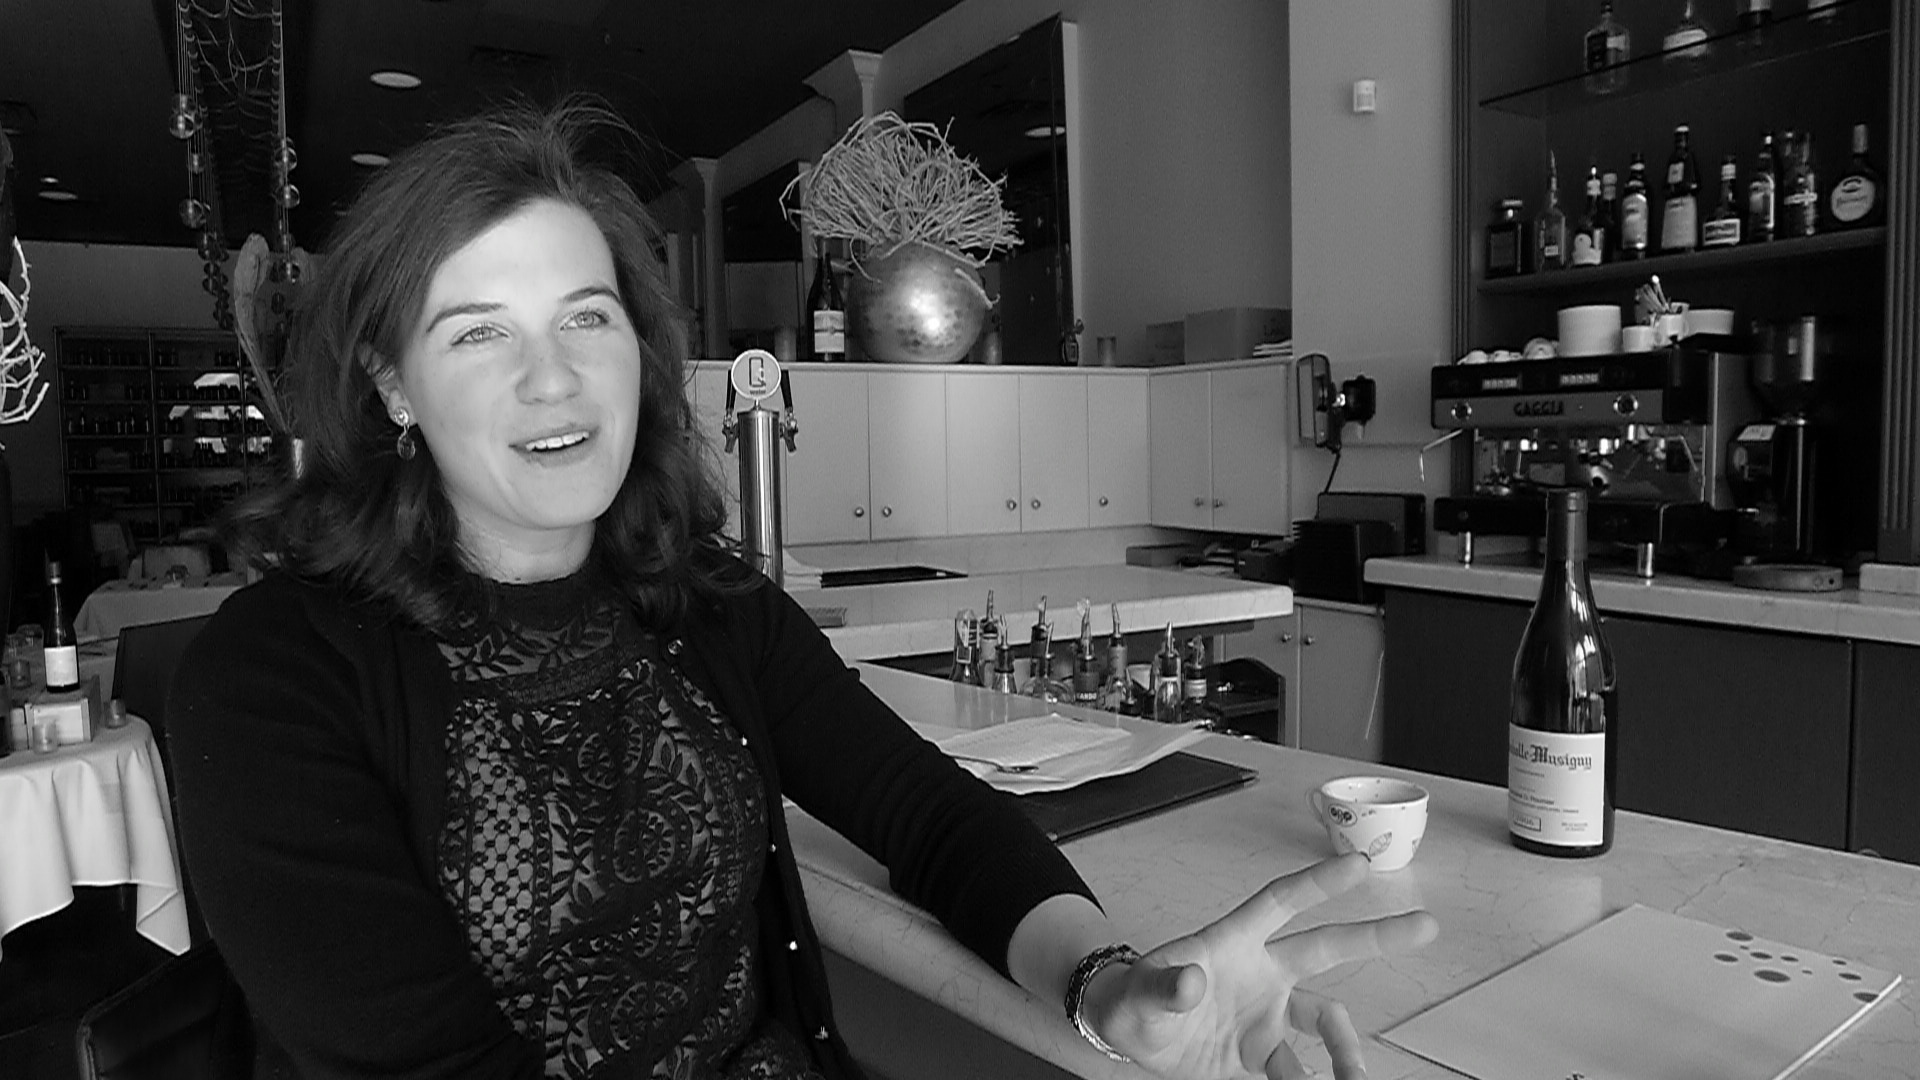 Splendido's Ellen Jakobsmeier at the bar.